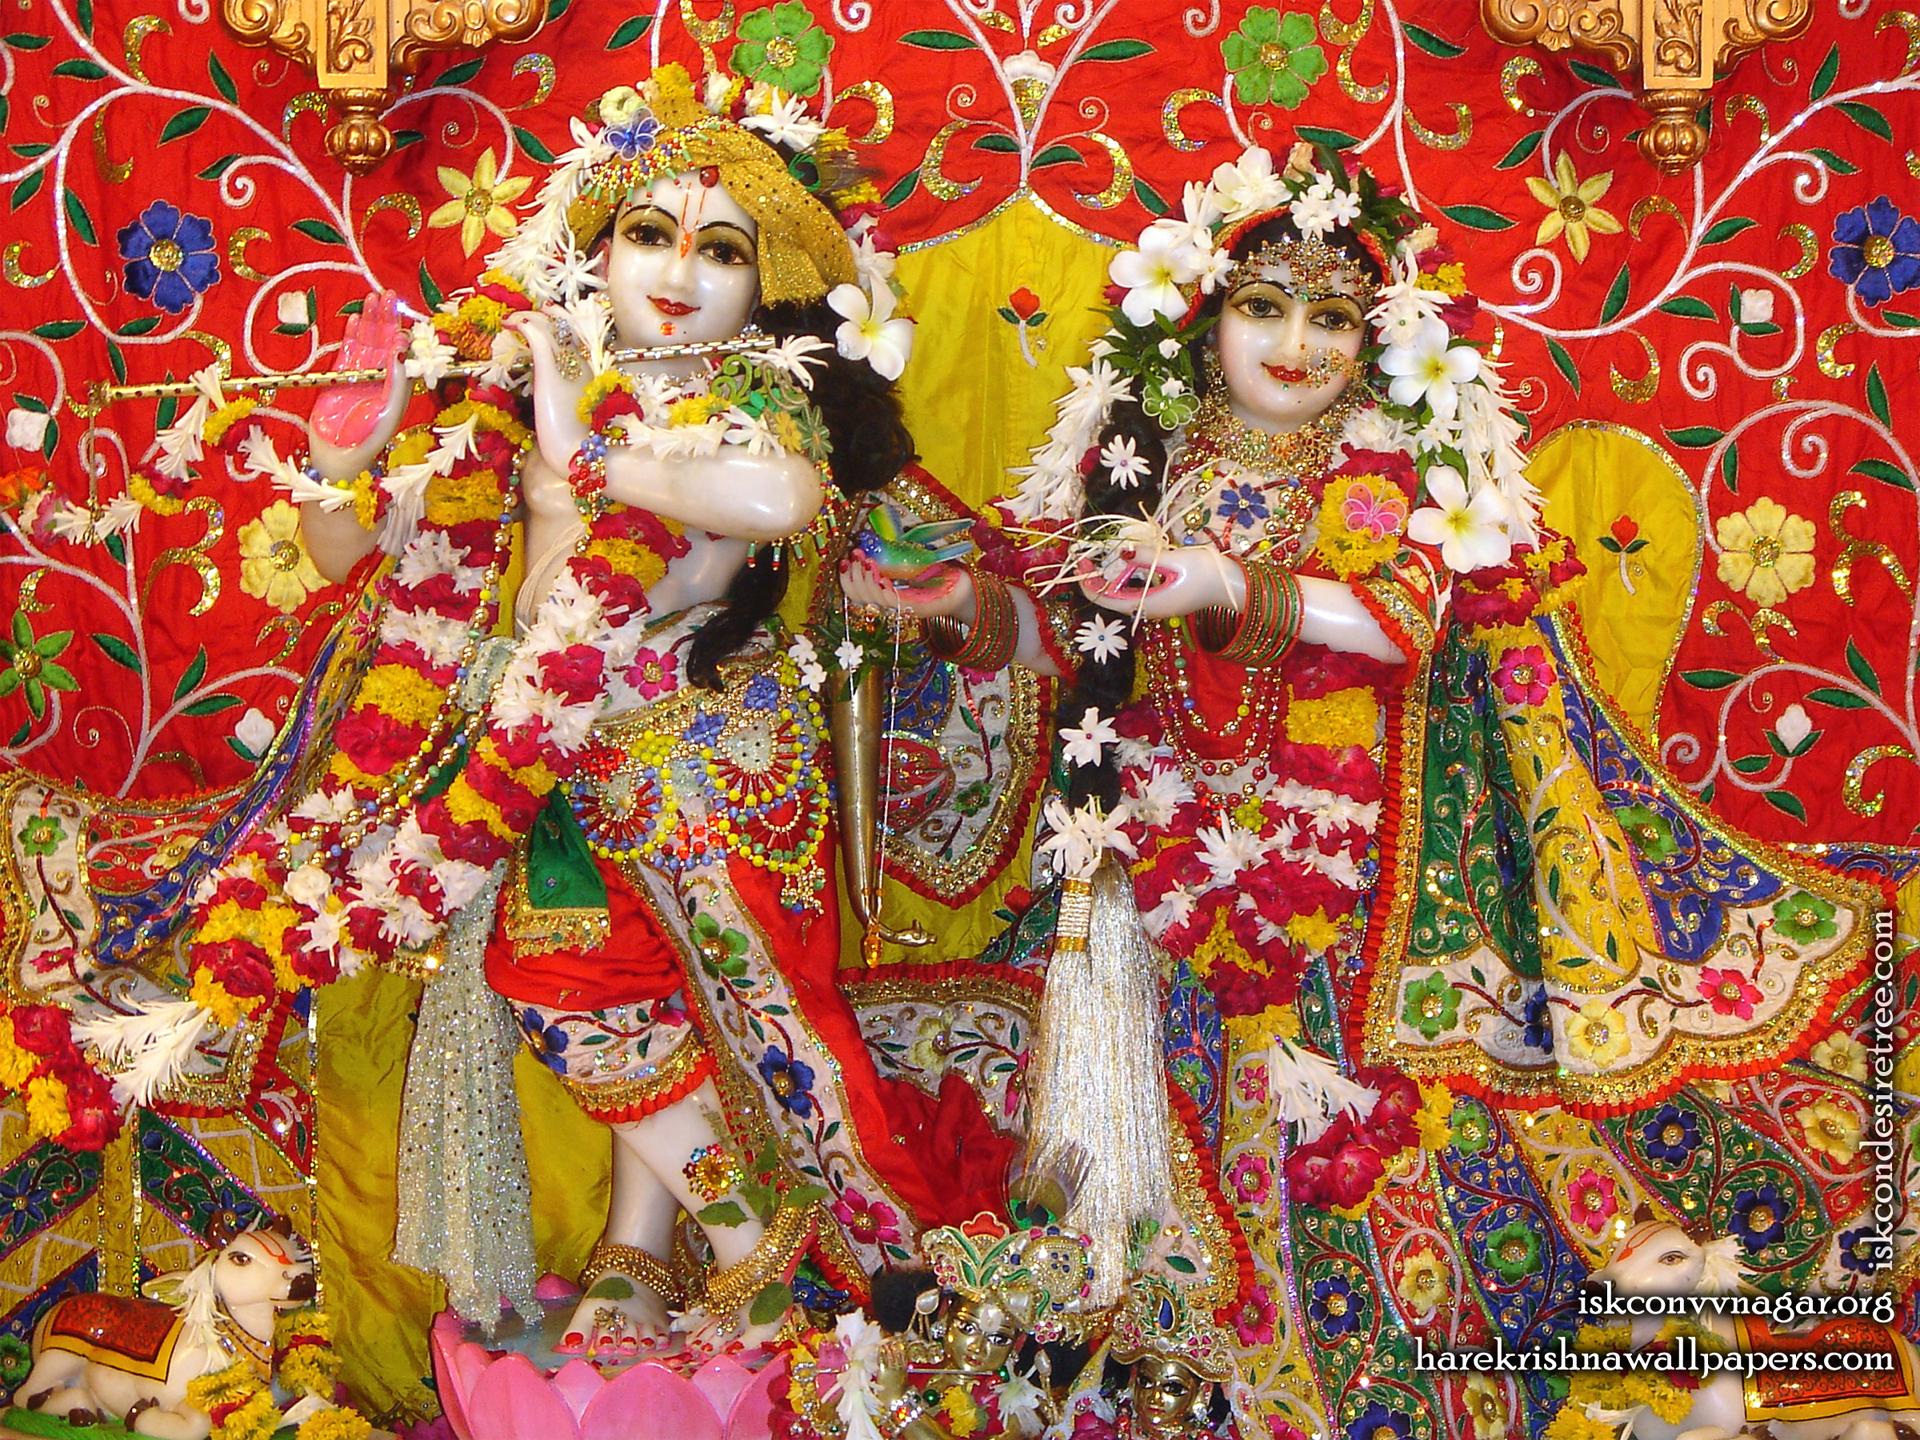 Sri Sri Radha Giridhari Wallpaper (013) Size 1920x1440 Download